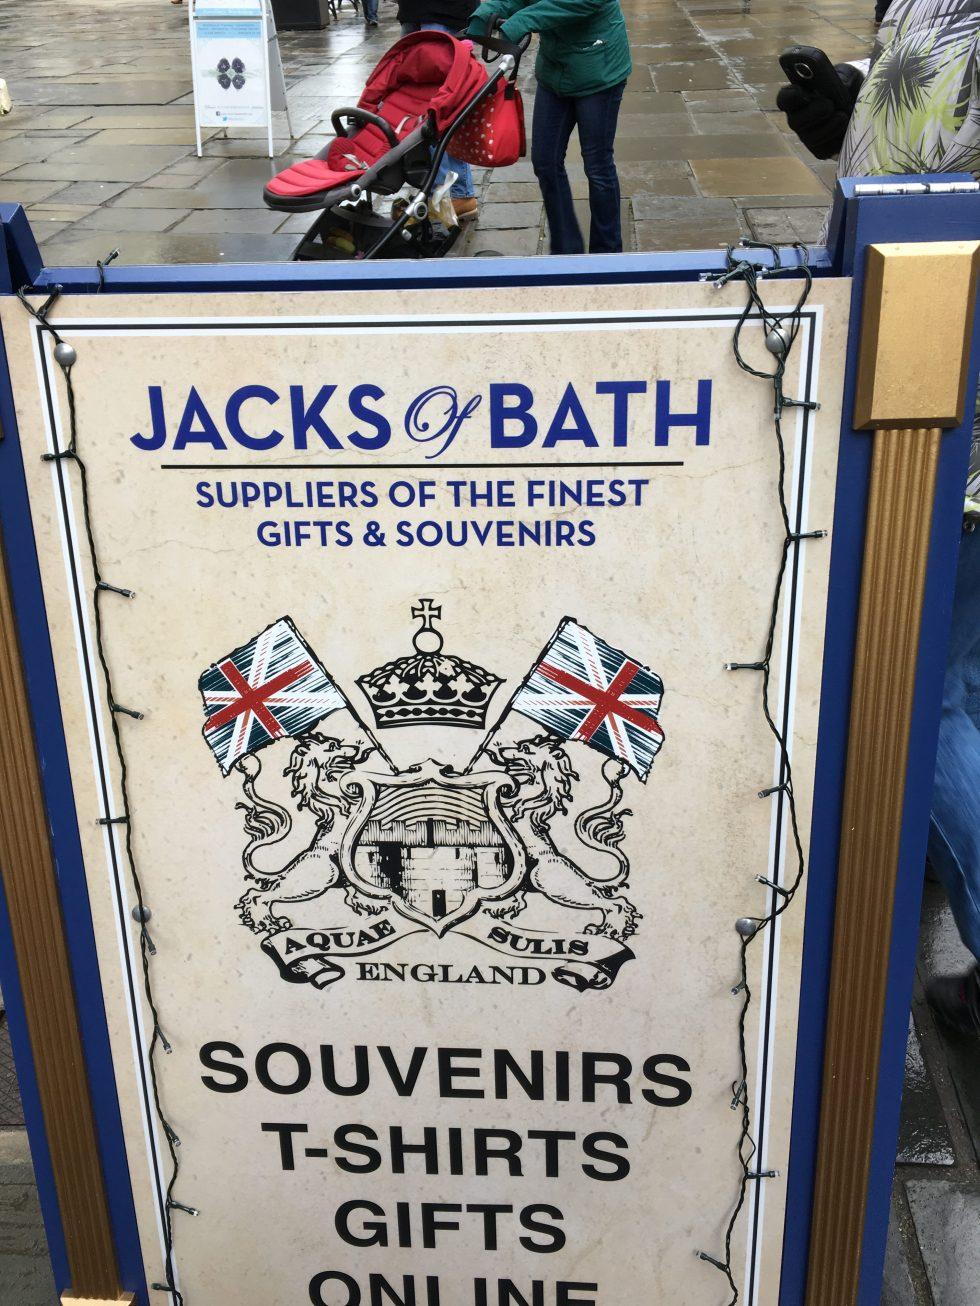 Jack's of Bath